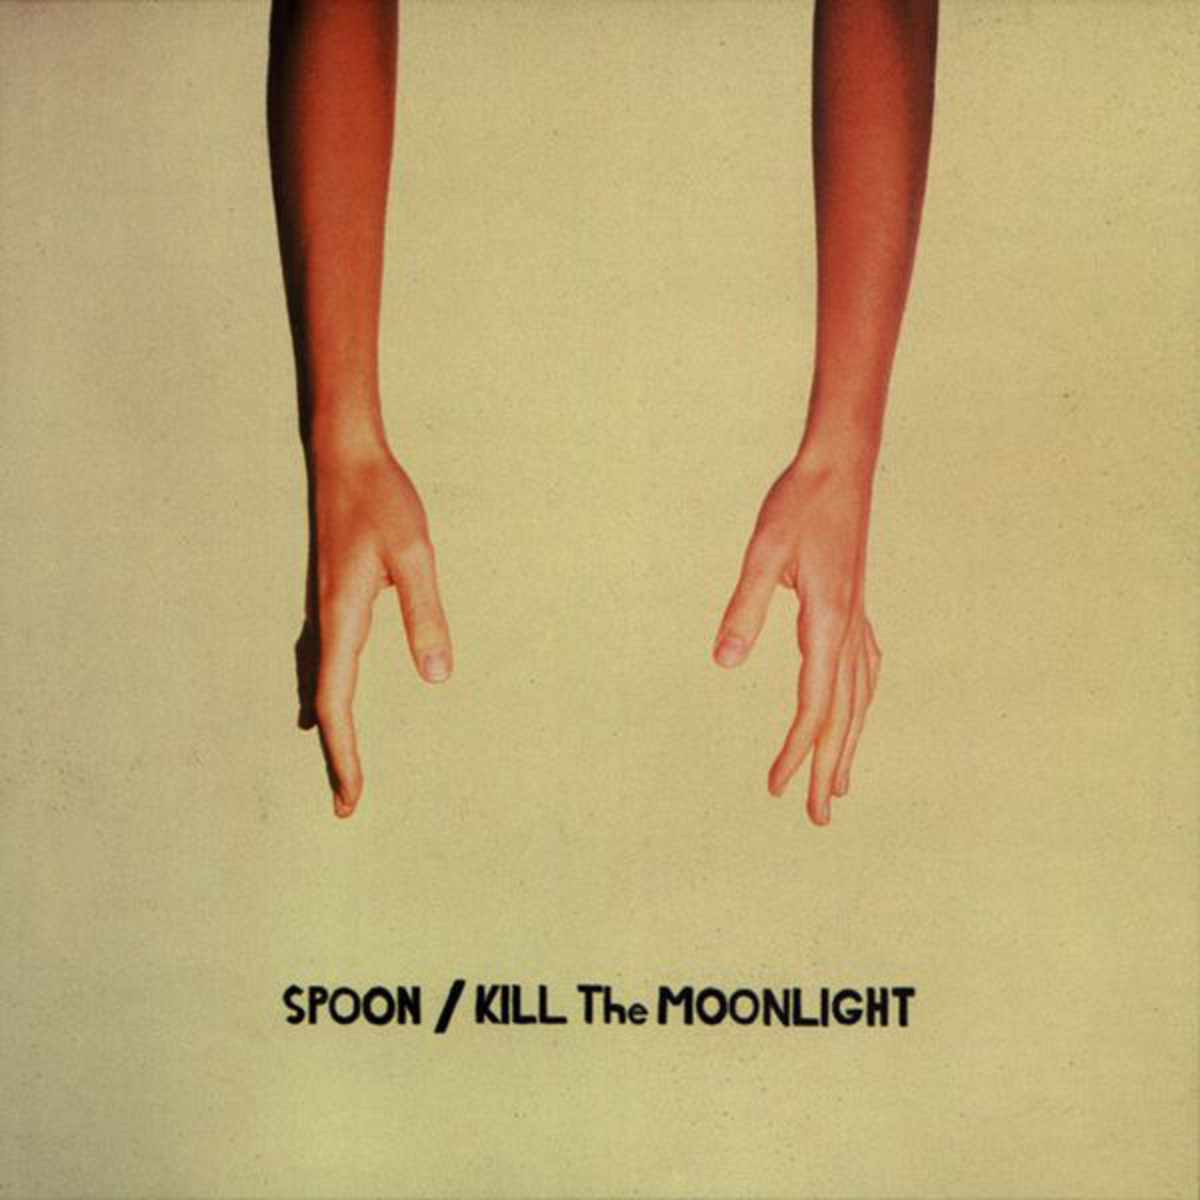 spoon kill the moonlight 1200x1200 Spoons Britt Daniel Breaks Down His Bands Entire Discography